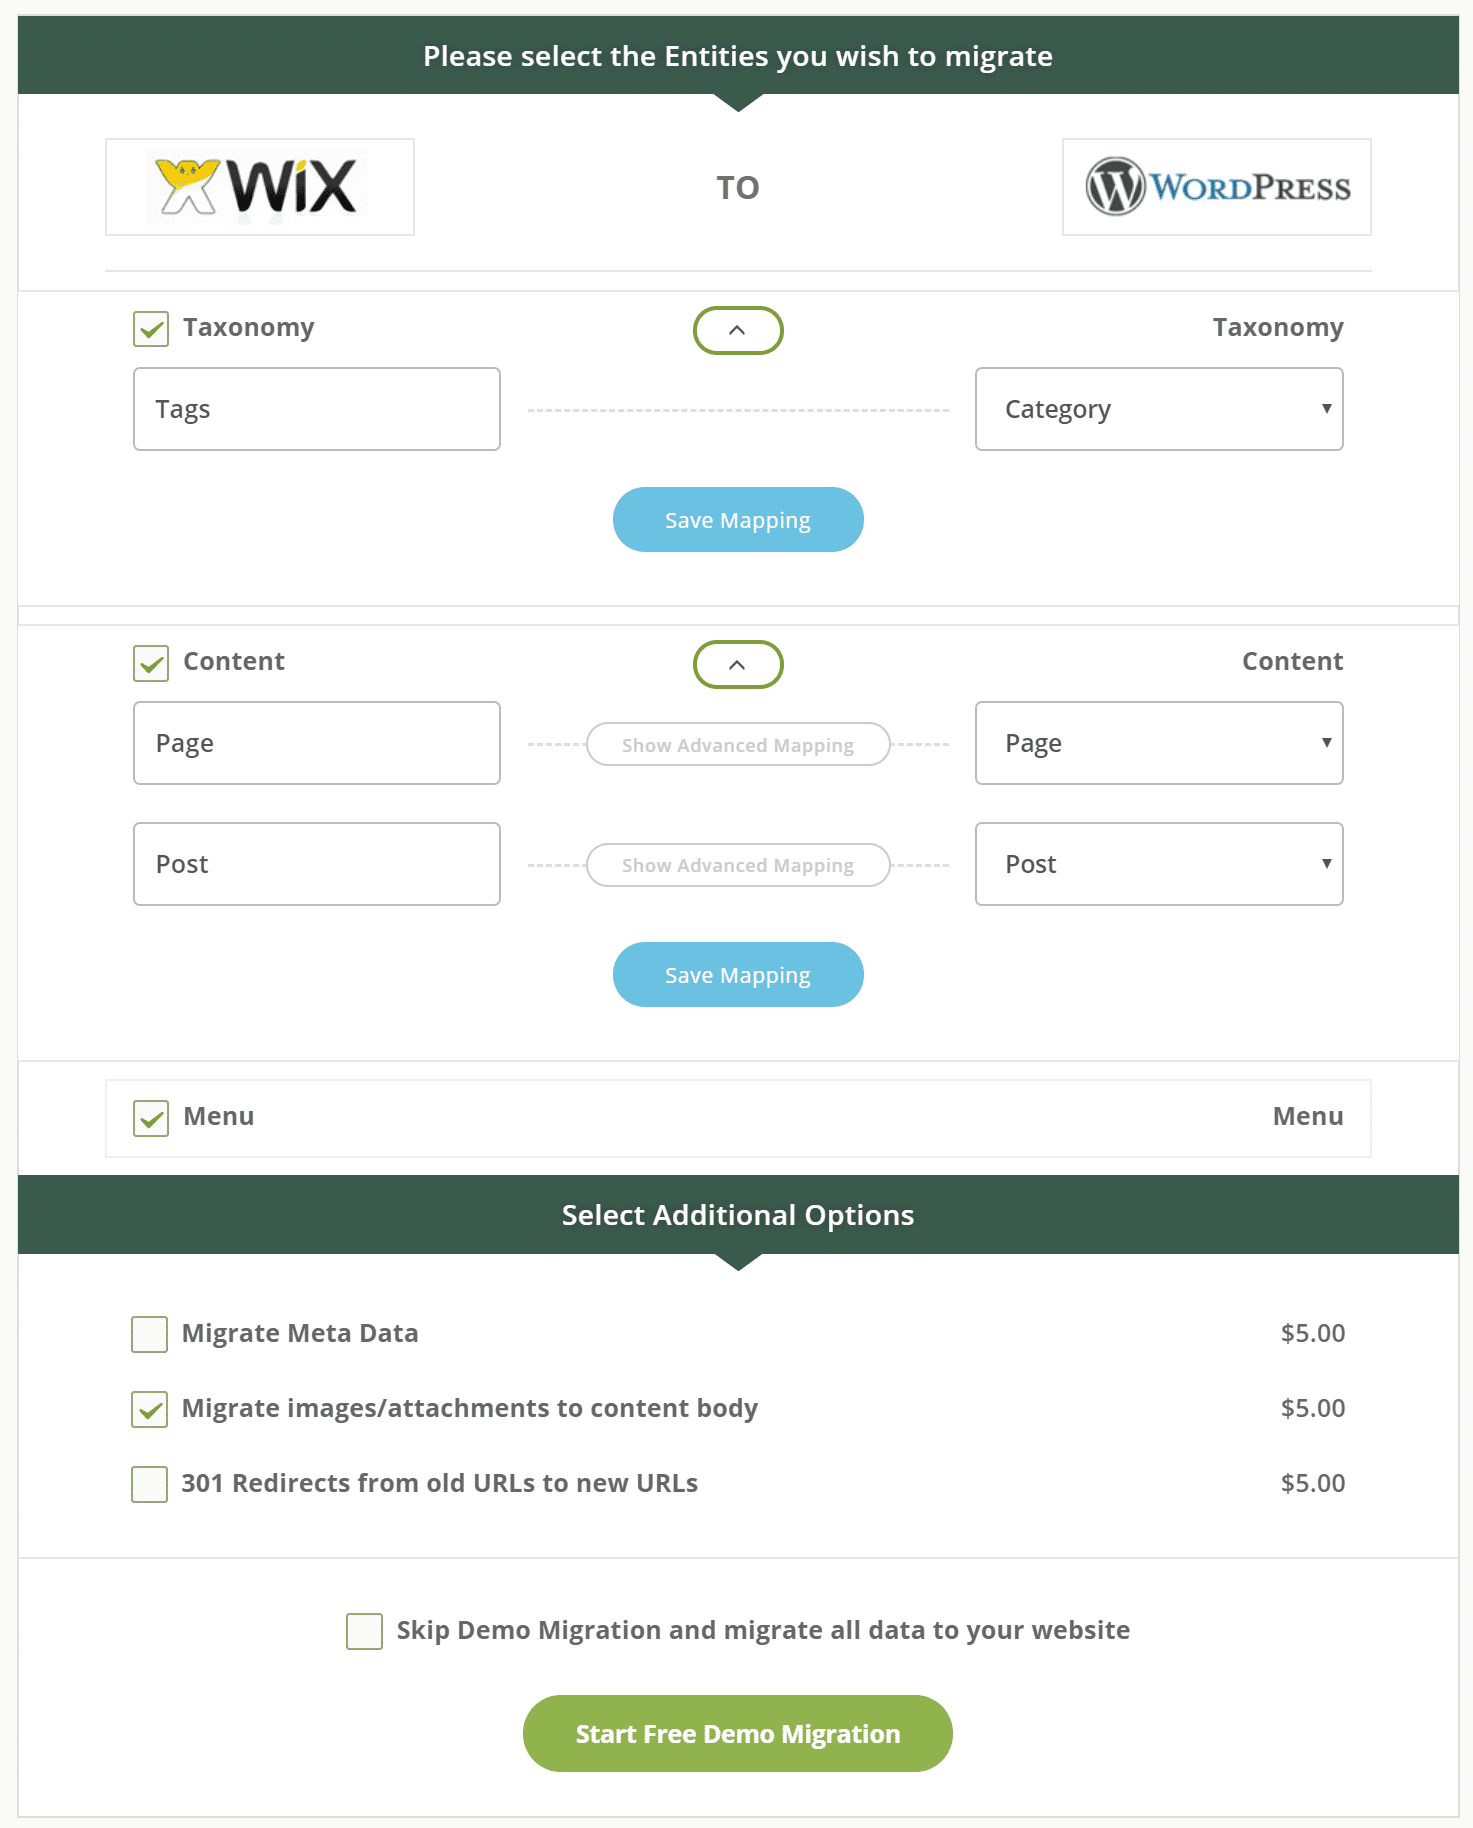 Entités de migration Wix vers WordPress